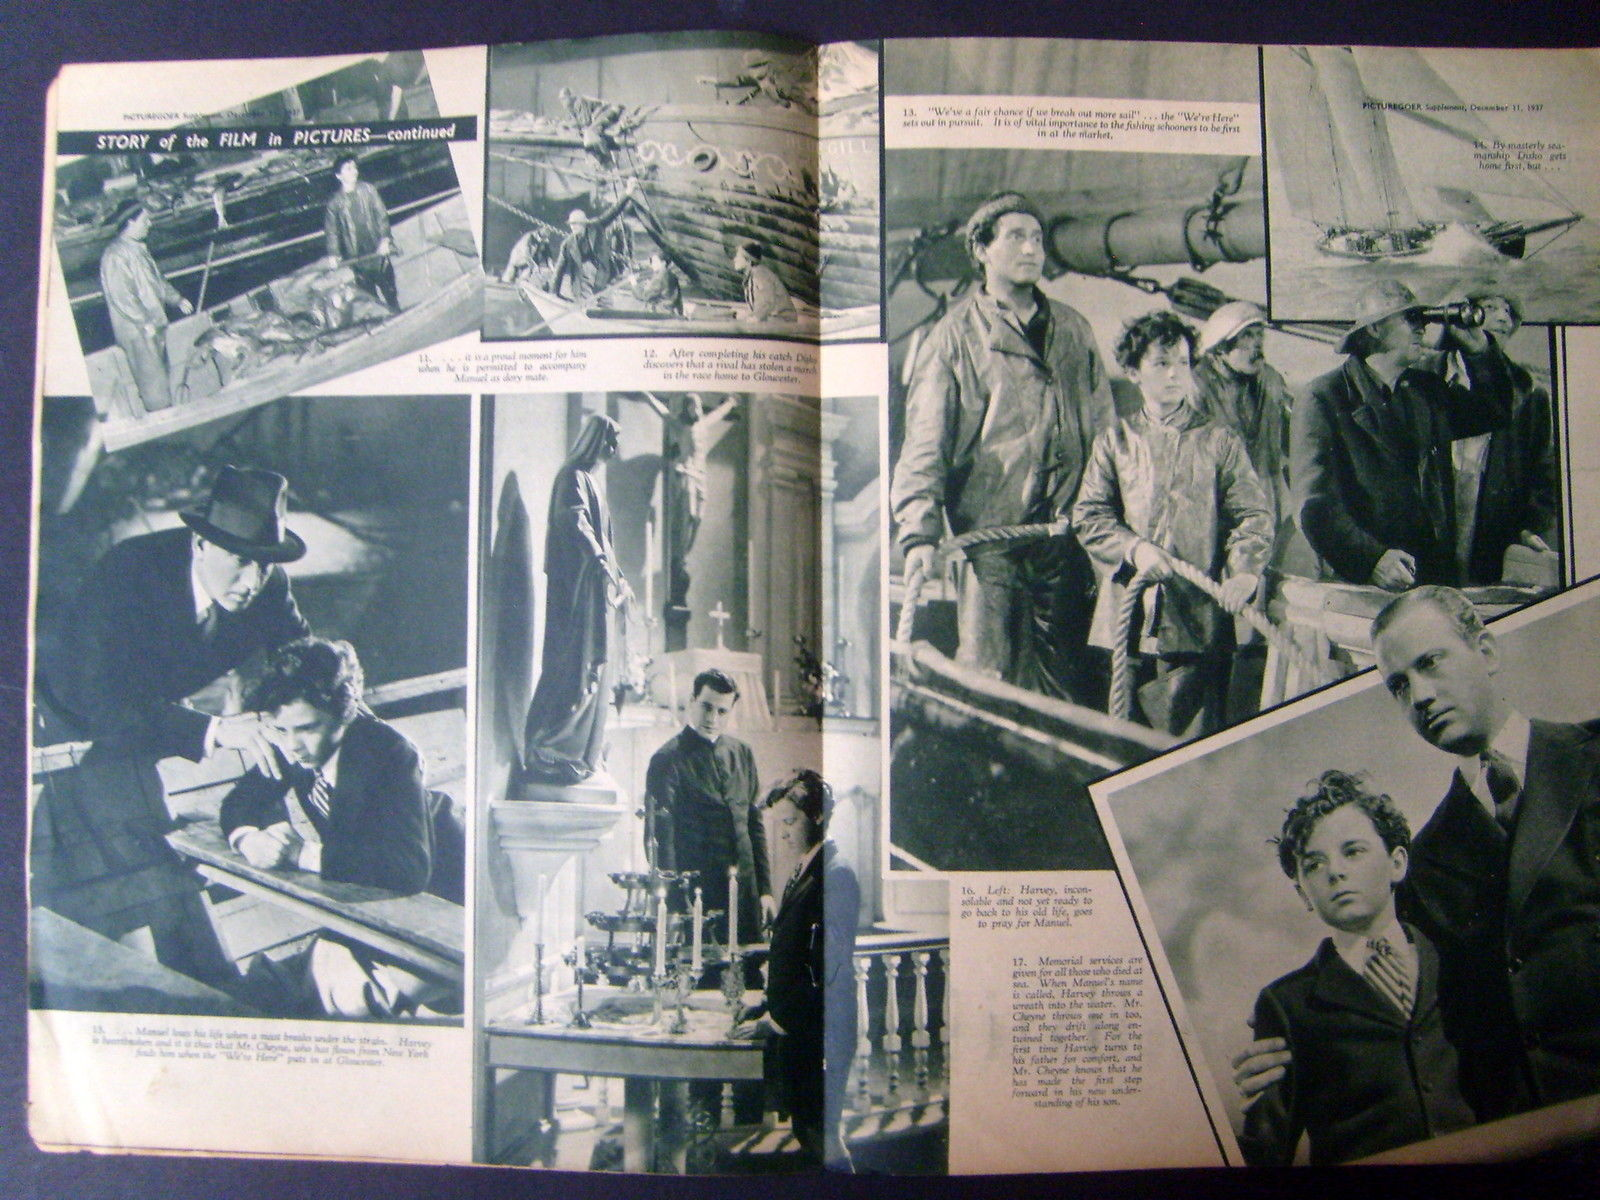 SPENCER TRACY,FREDDIE BARTHOLOMEW (CAPTAINS COURAGEOUS) RARE 1937 MOVIE PROGRAM